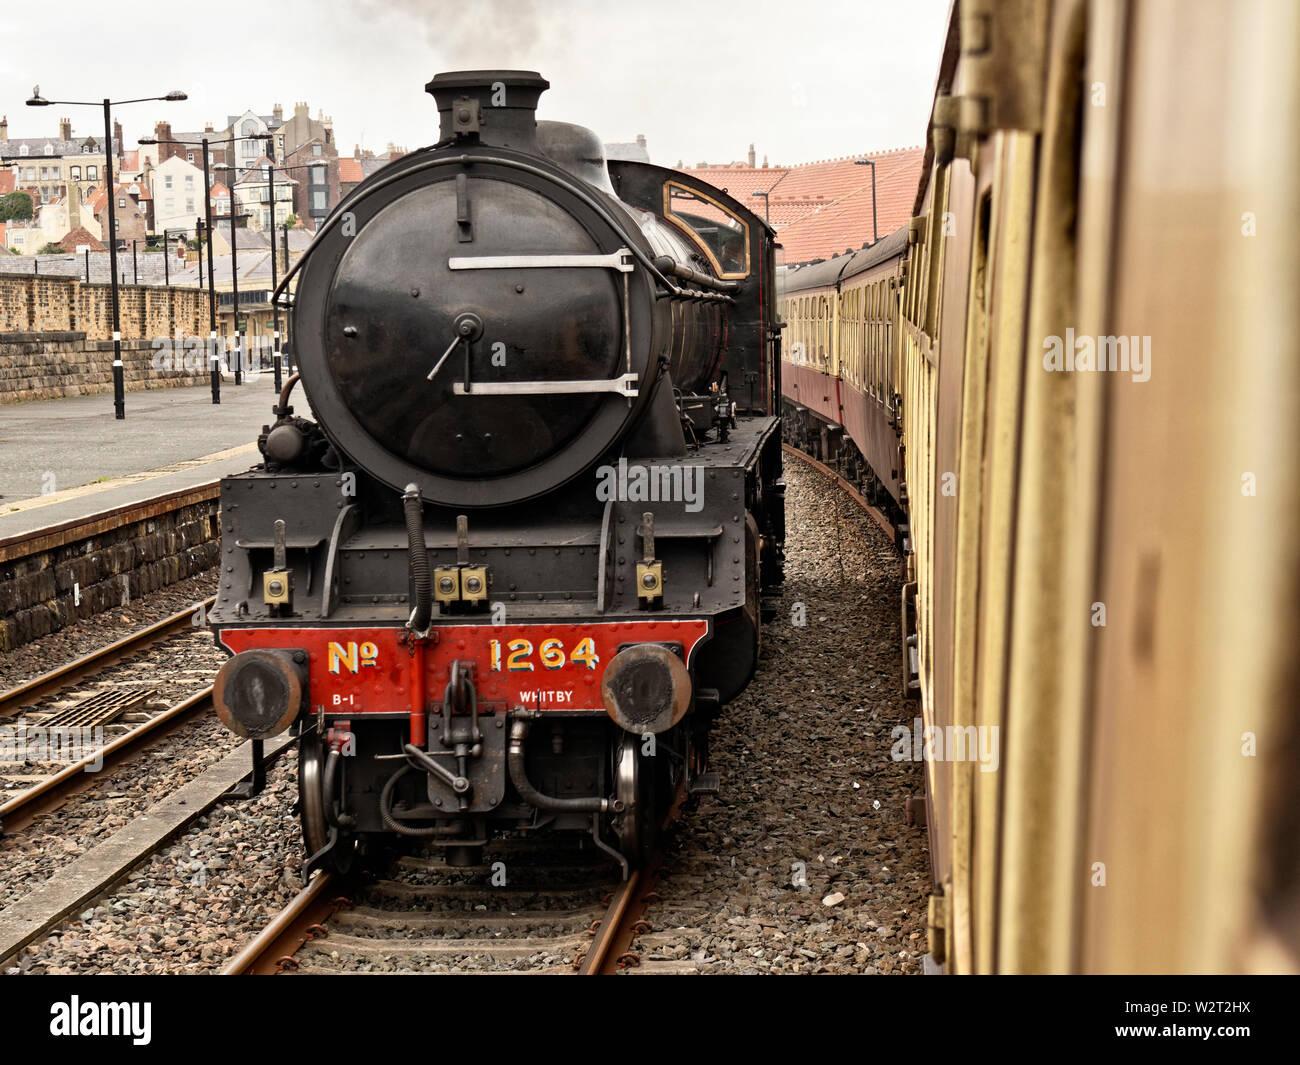 Locomotive LNER B1 61264 at Whitby Station Stock Photo